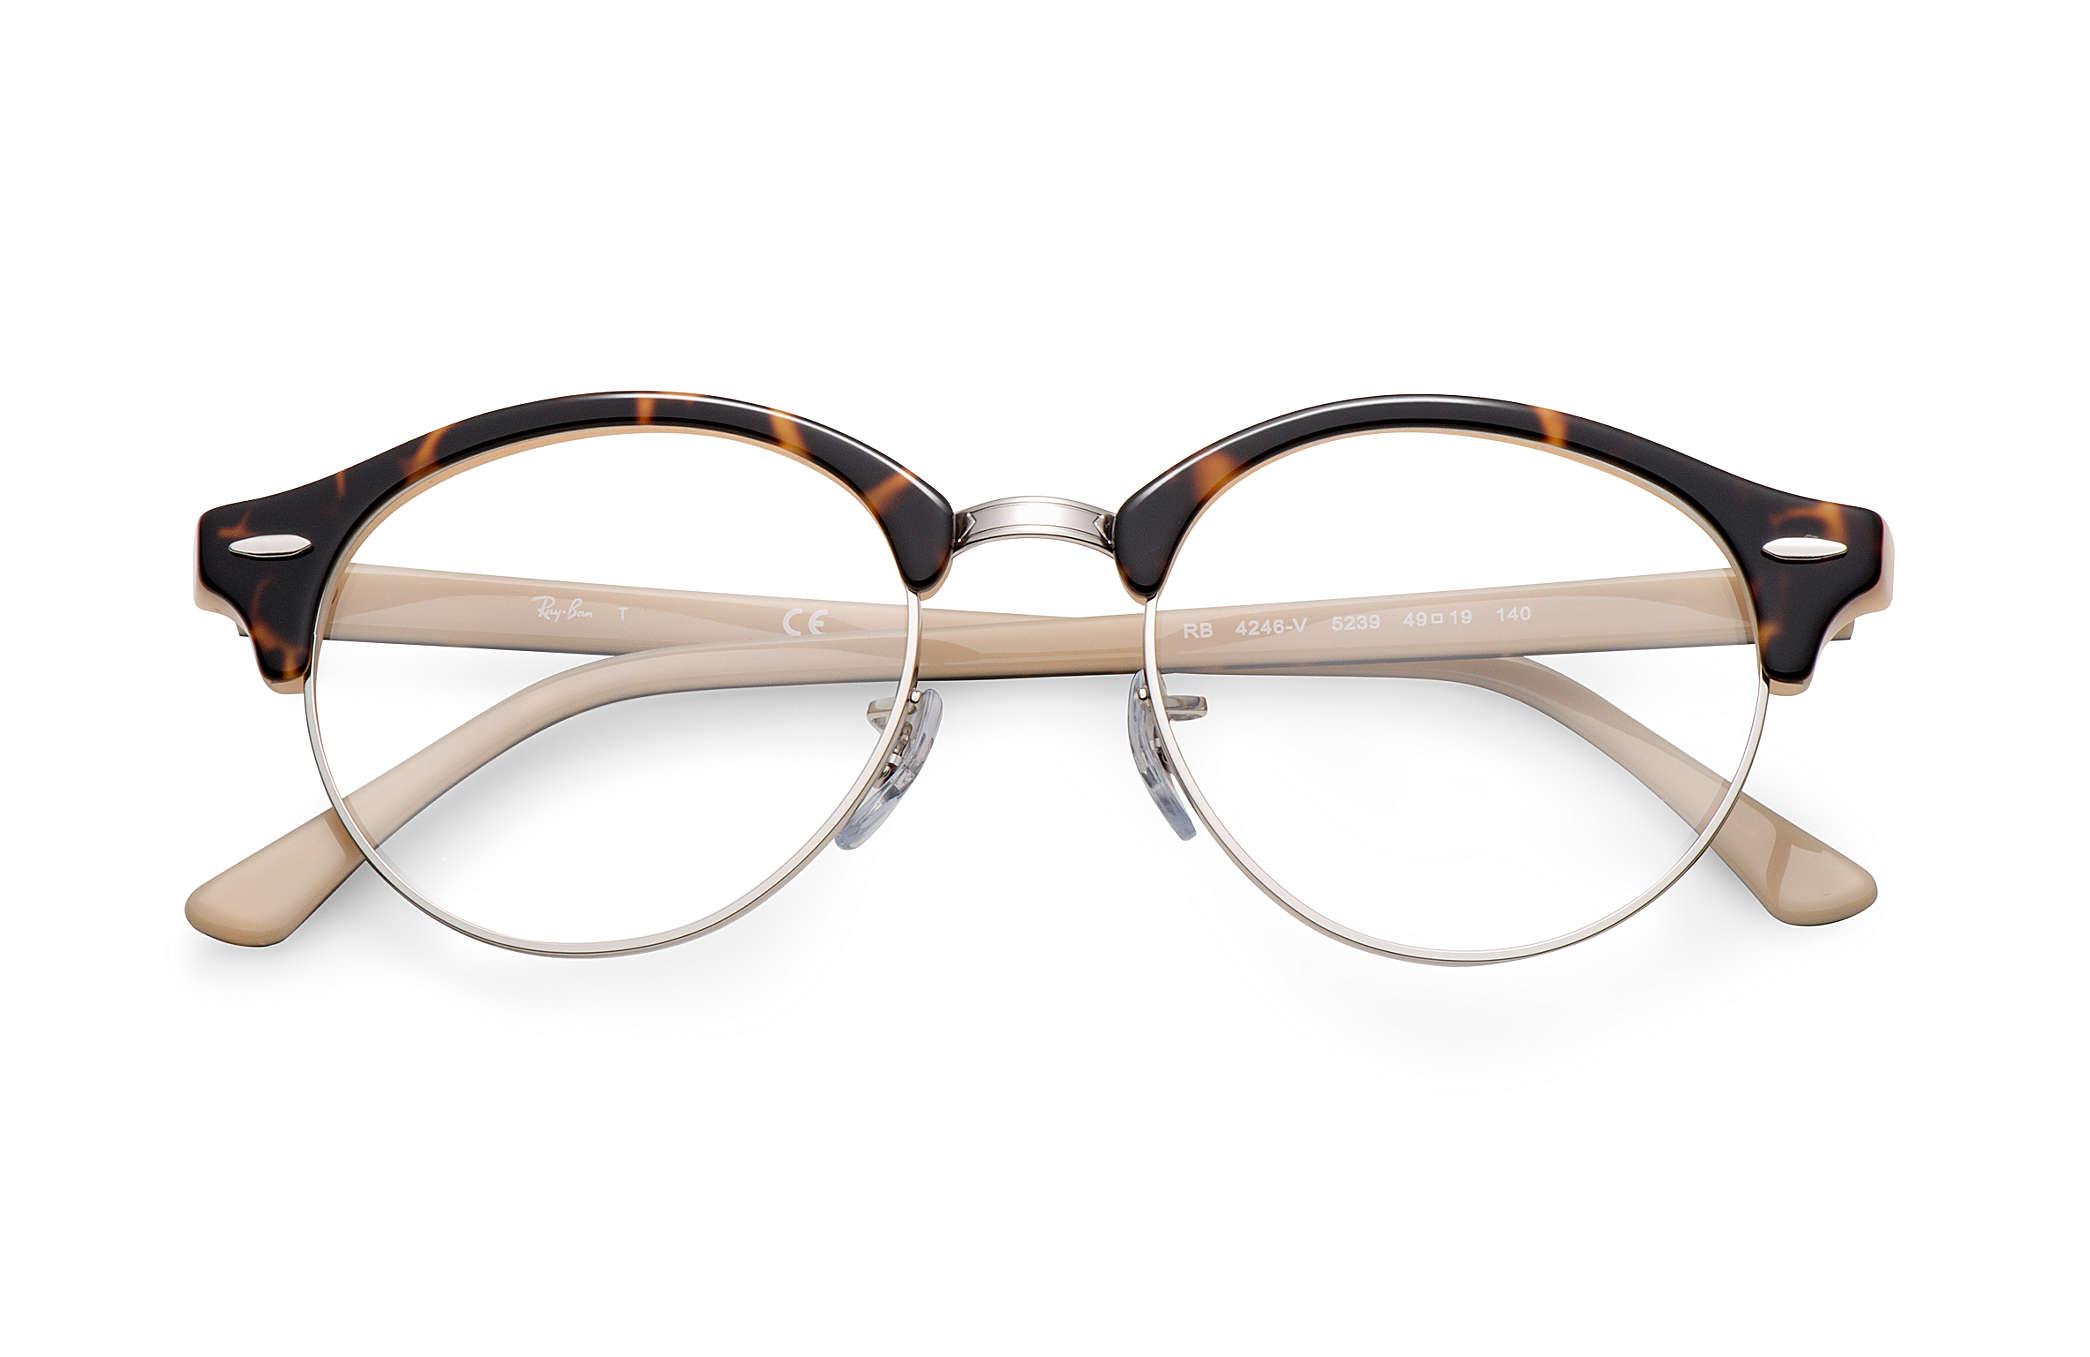 0b0e0d59d9 Ray-Ban eyeglasses Clubround Optics RB4246V Tortoise - Acetate ...